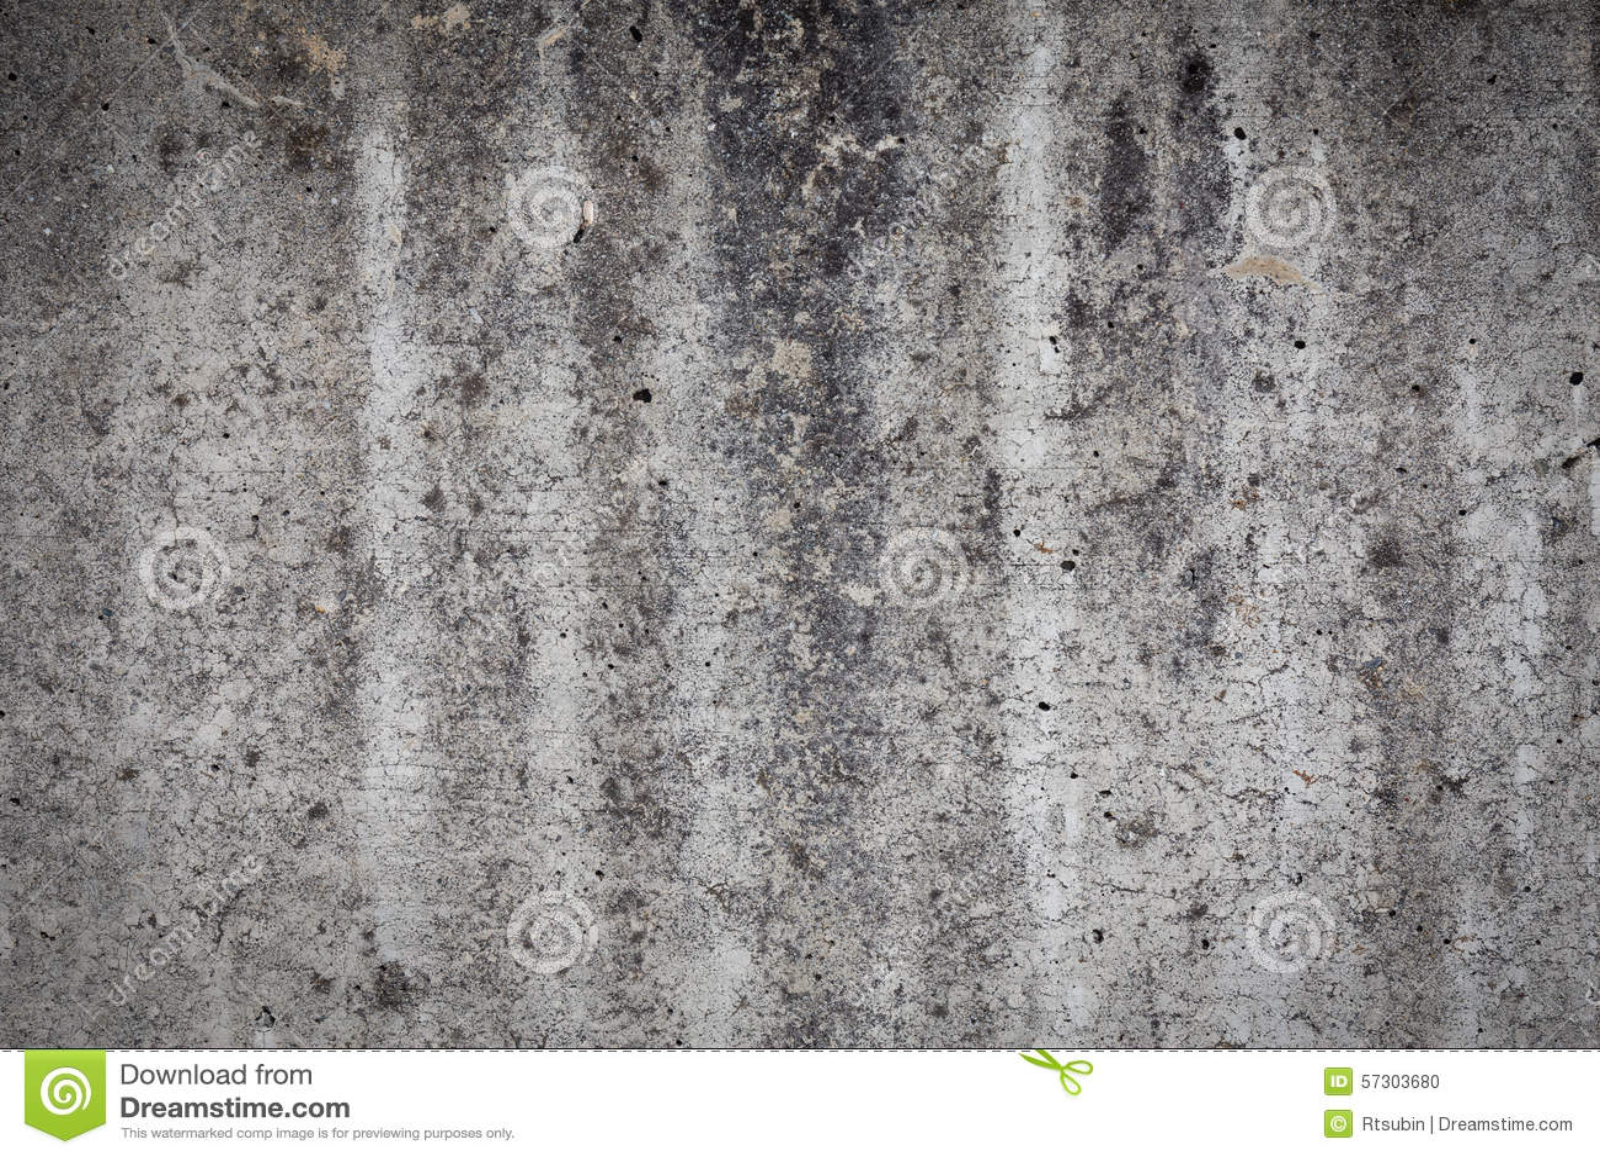 smooth concrete background - photo #30